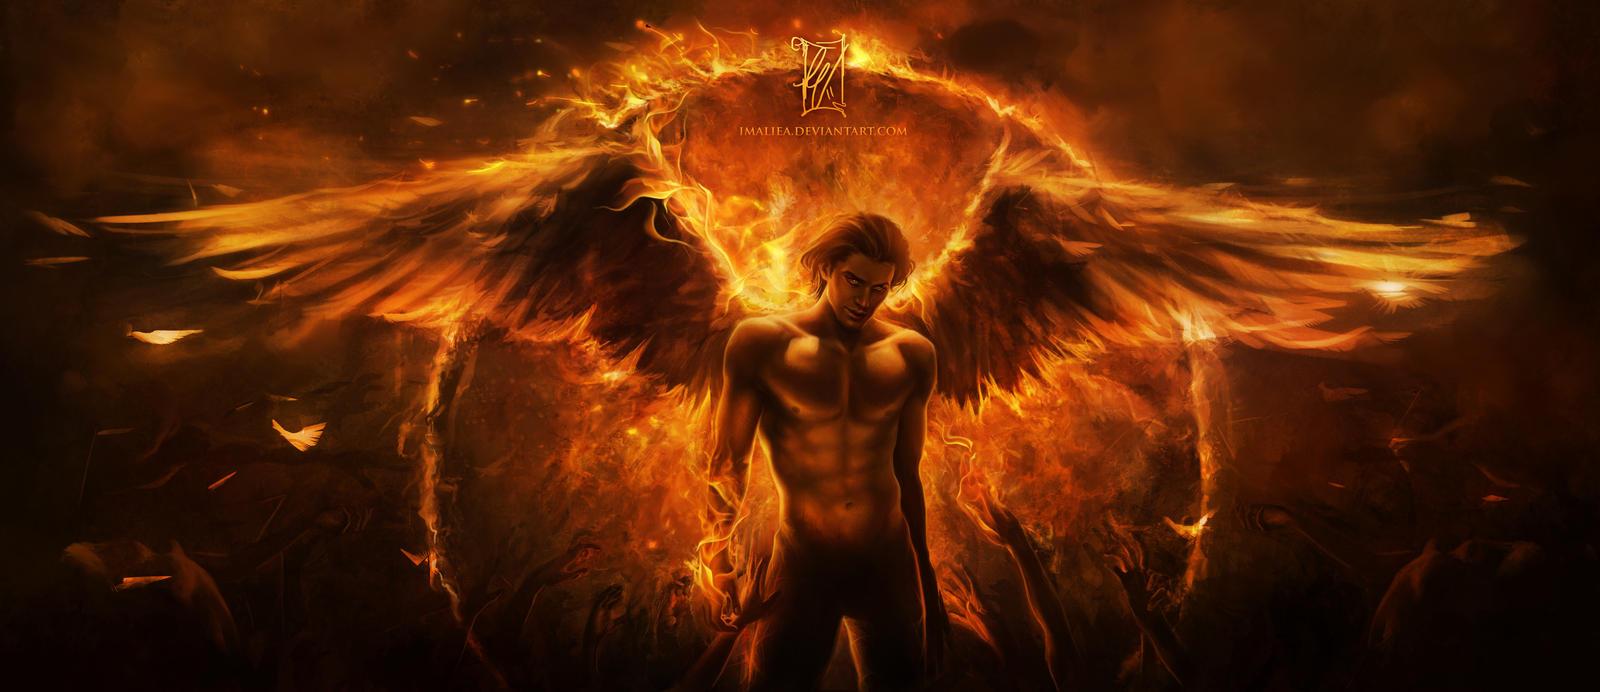 Those who favour fire by Imaliea on DeviantArt